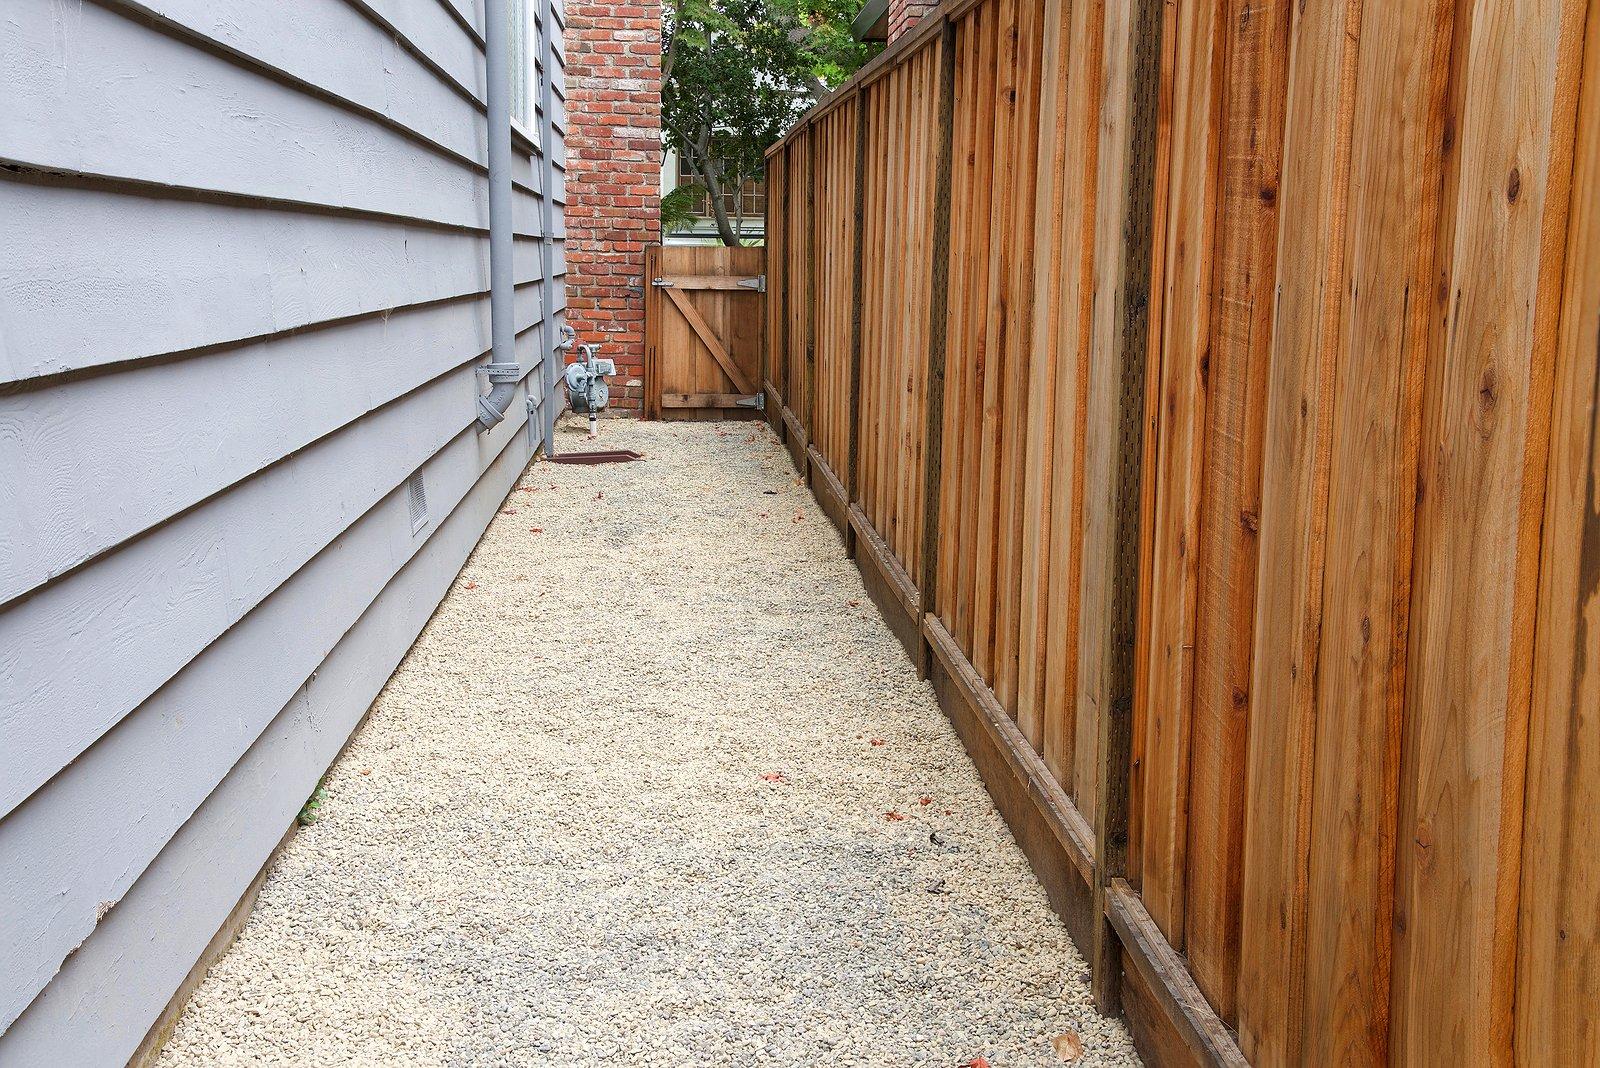 new-fence-property-value-renaissance-development-dc